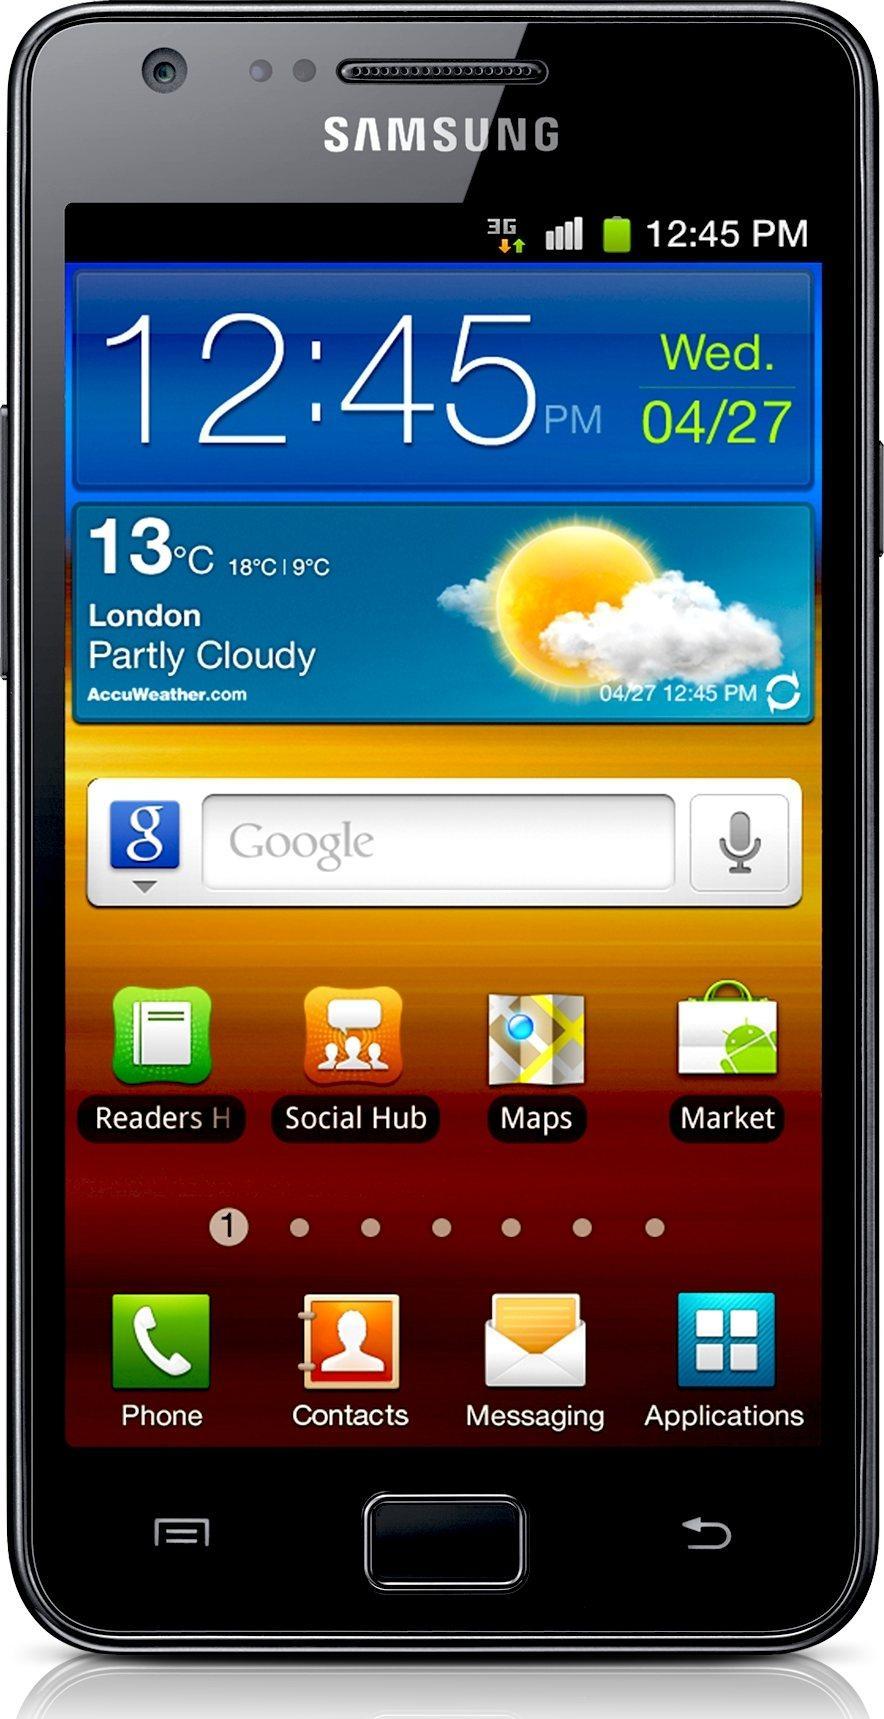 Galaxy S 2 GT-I9100